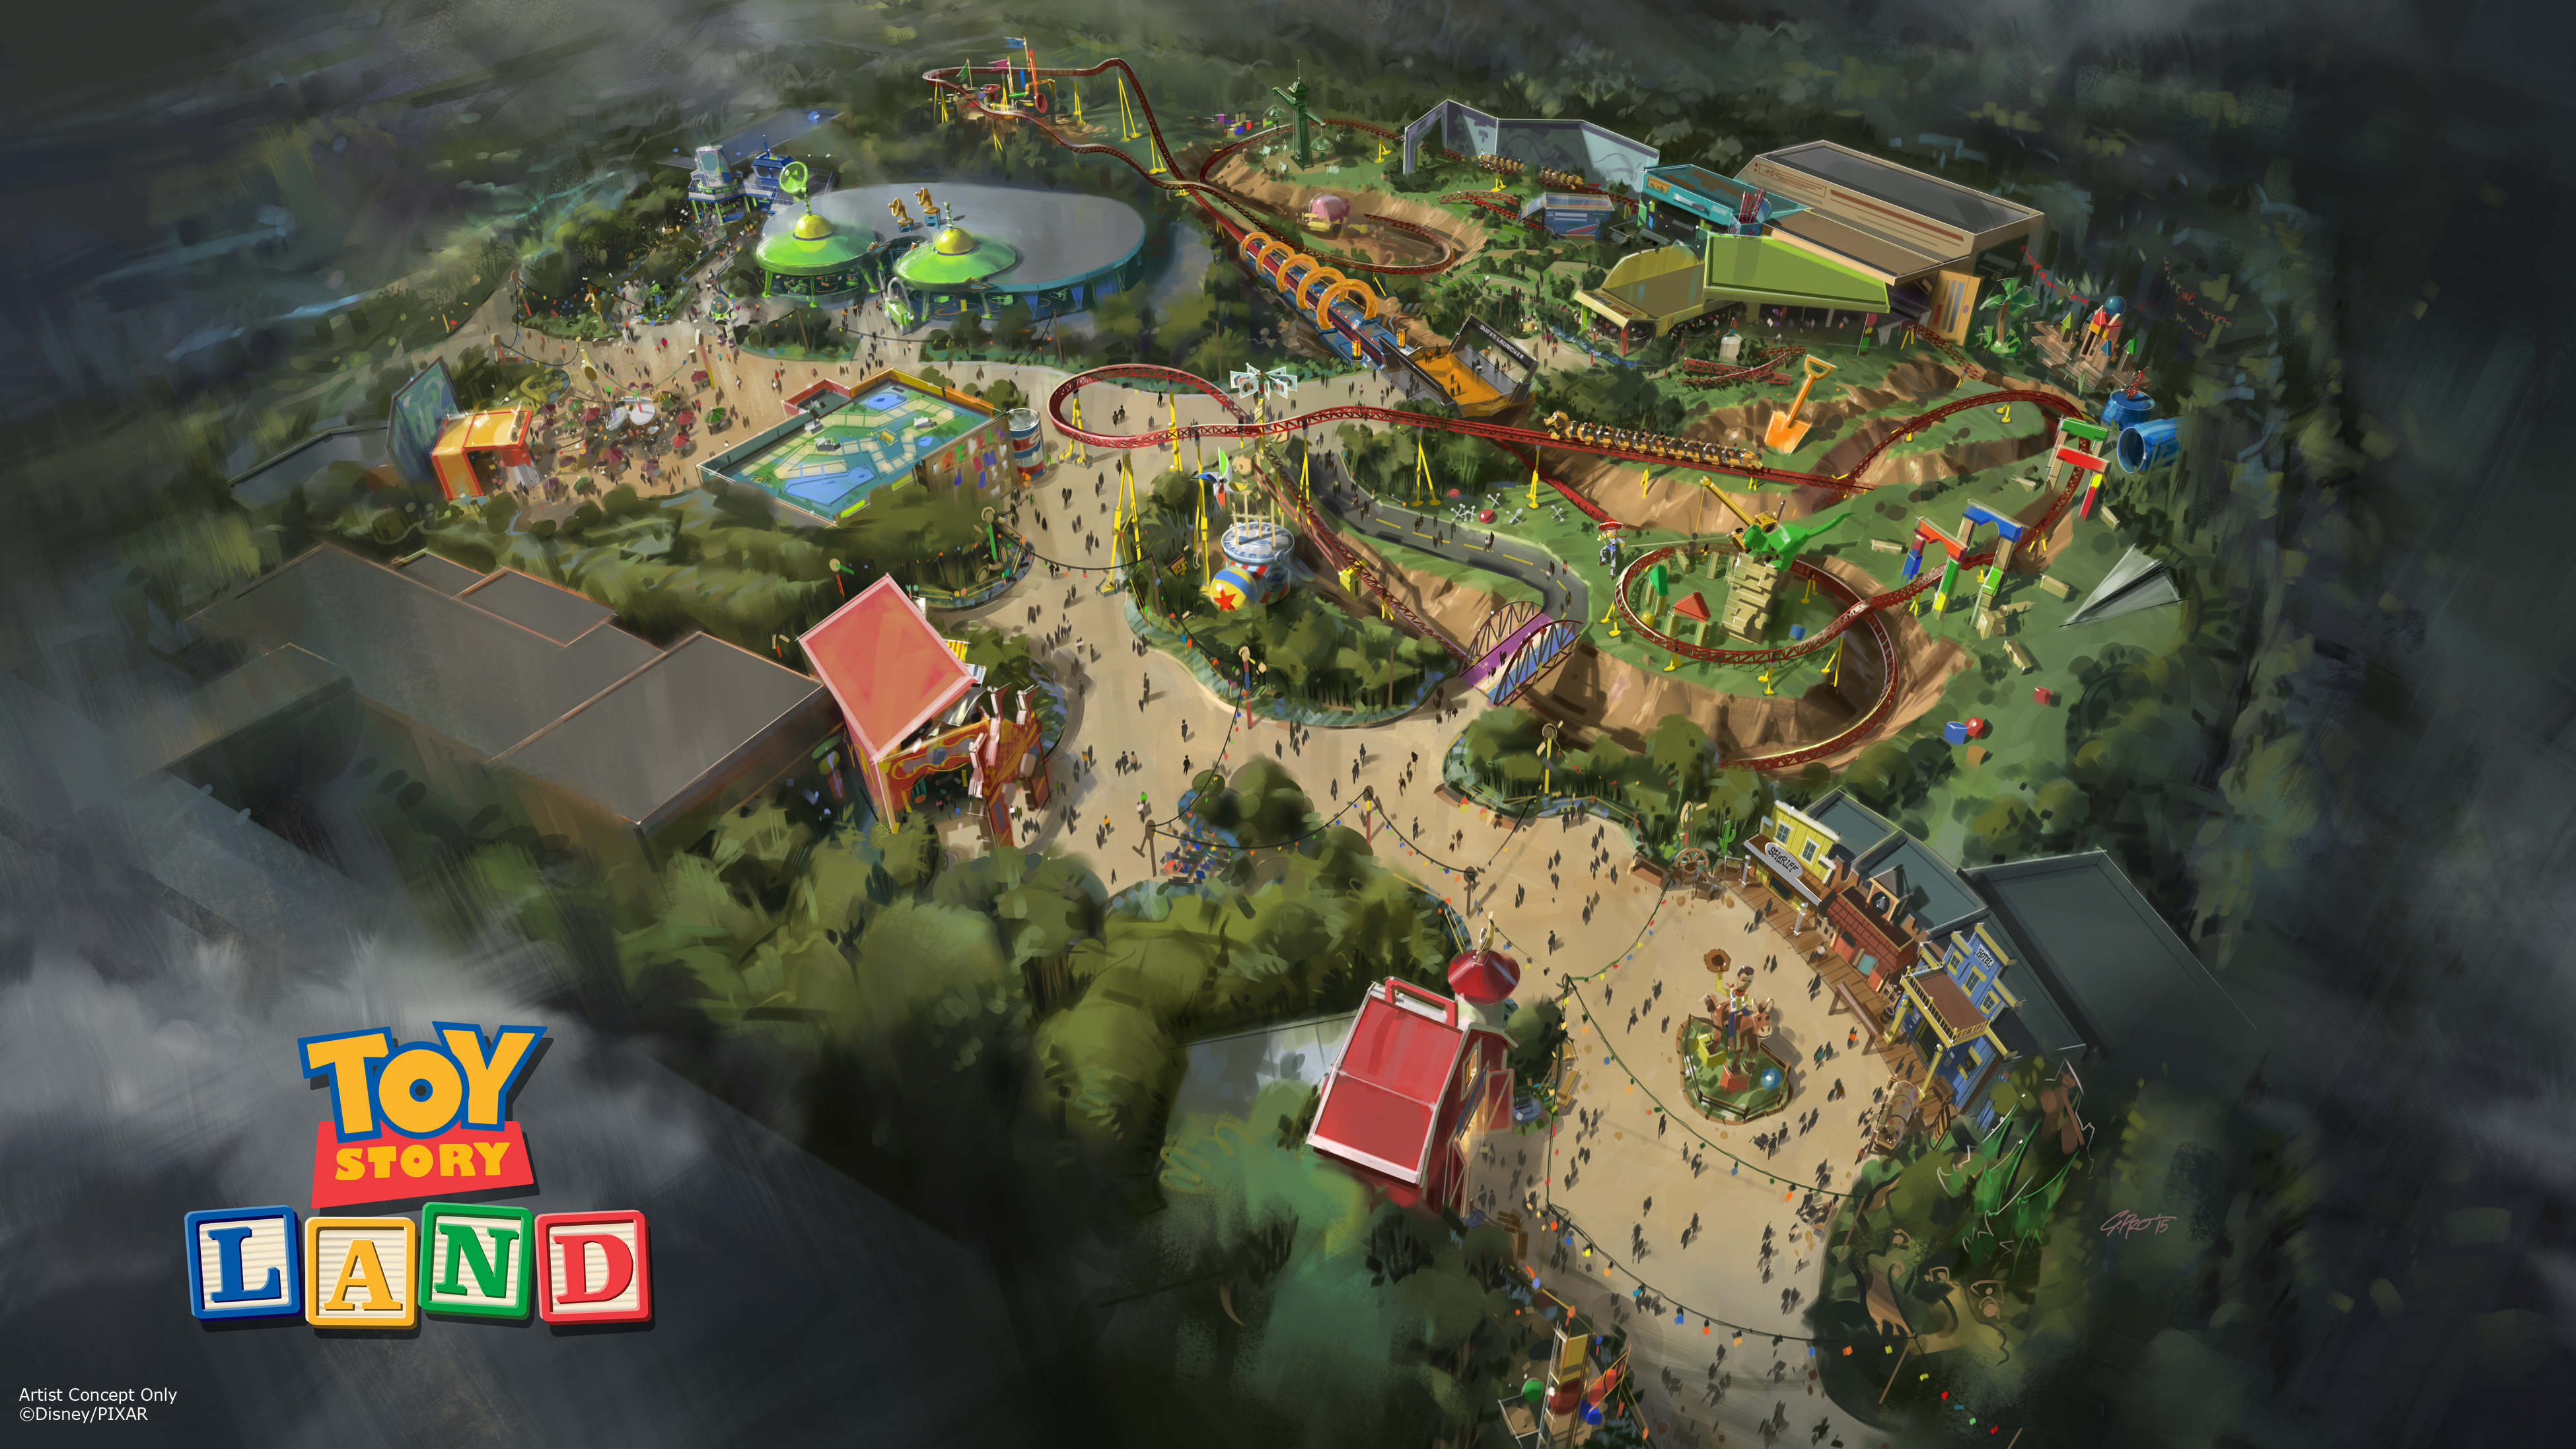 Toy Story Land Disney Park